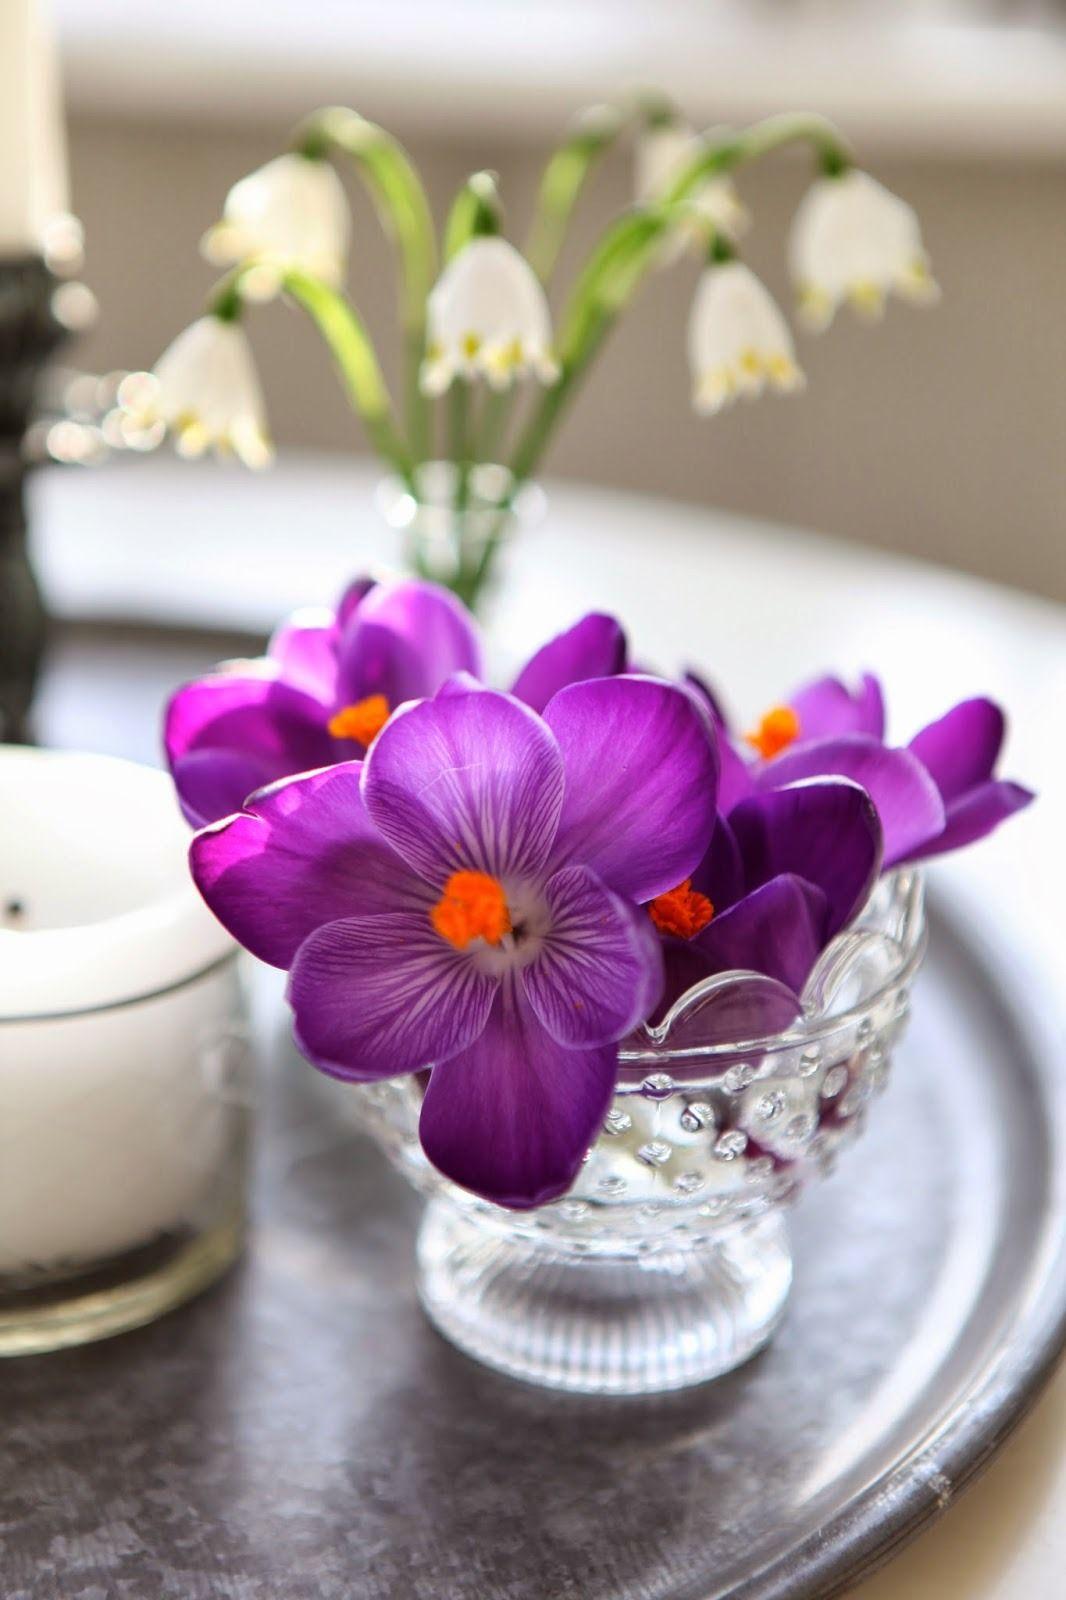 「Flowers」おしゃれまとめの人気アイデア|Pinterest|Barbara Haskell フラワー